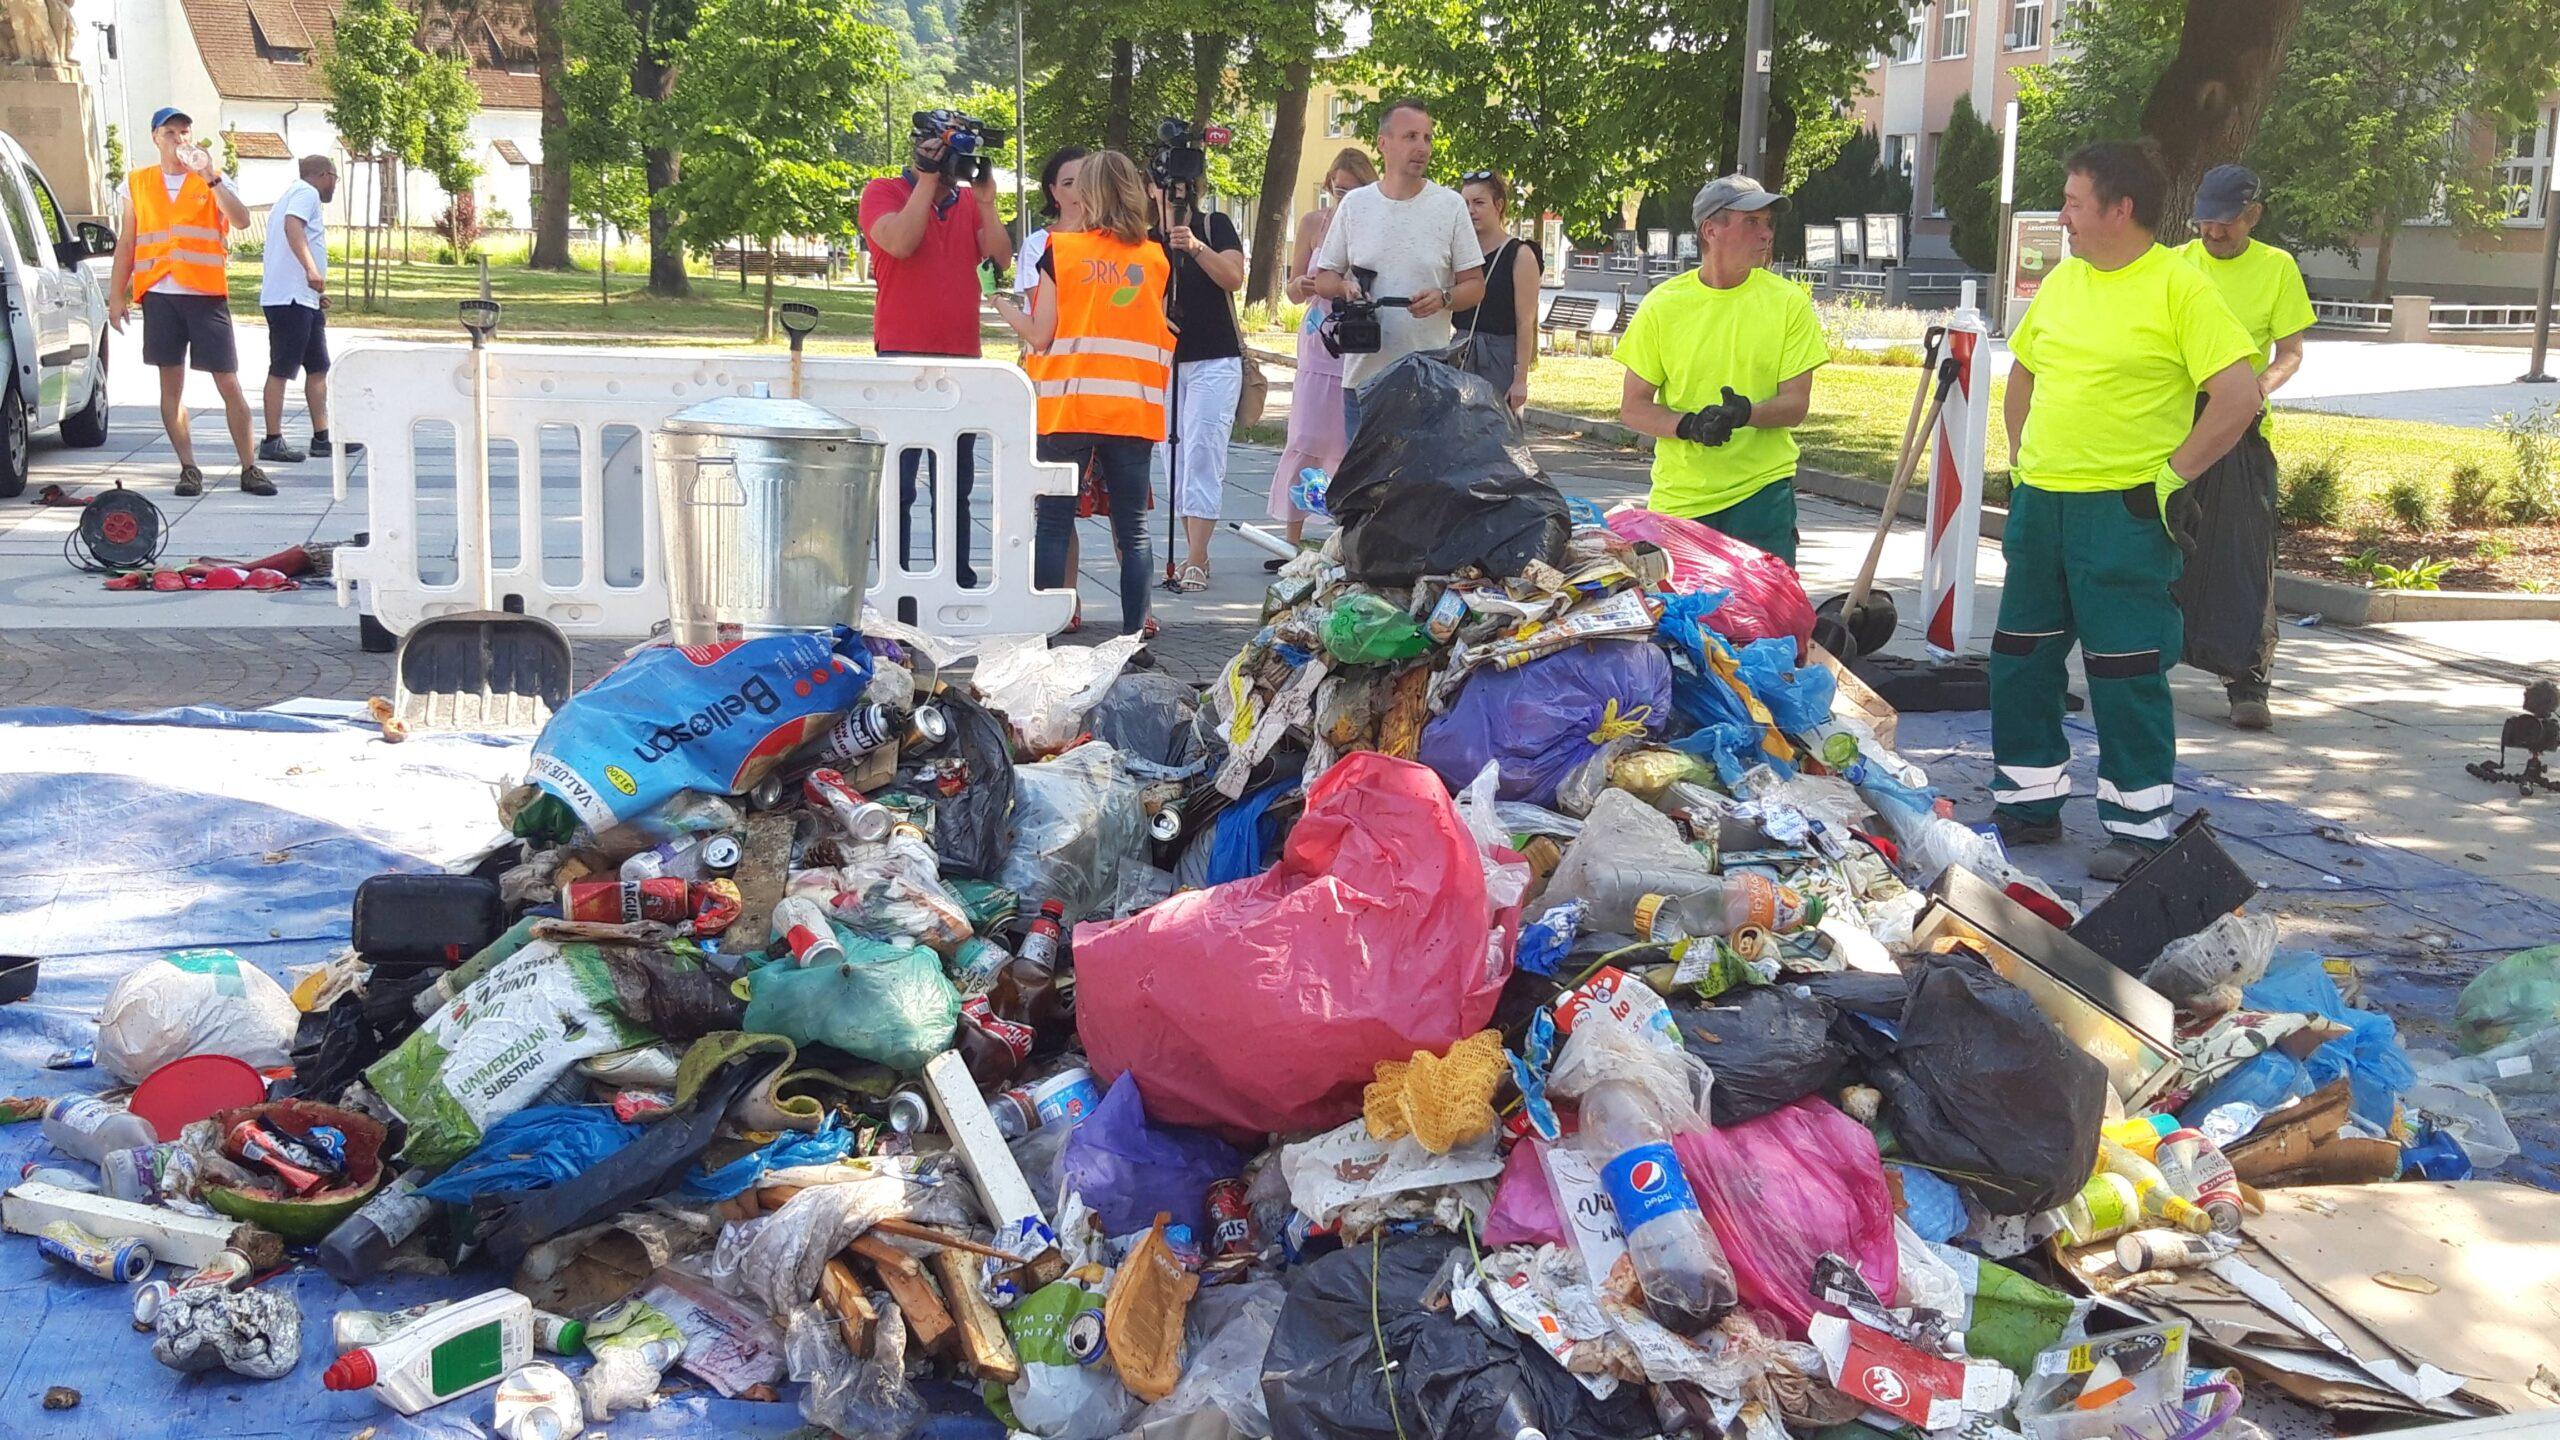 analyza odpadu, Handlova, analyza odpadov, jrk